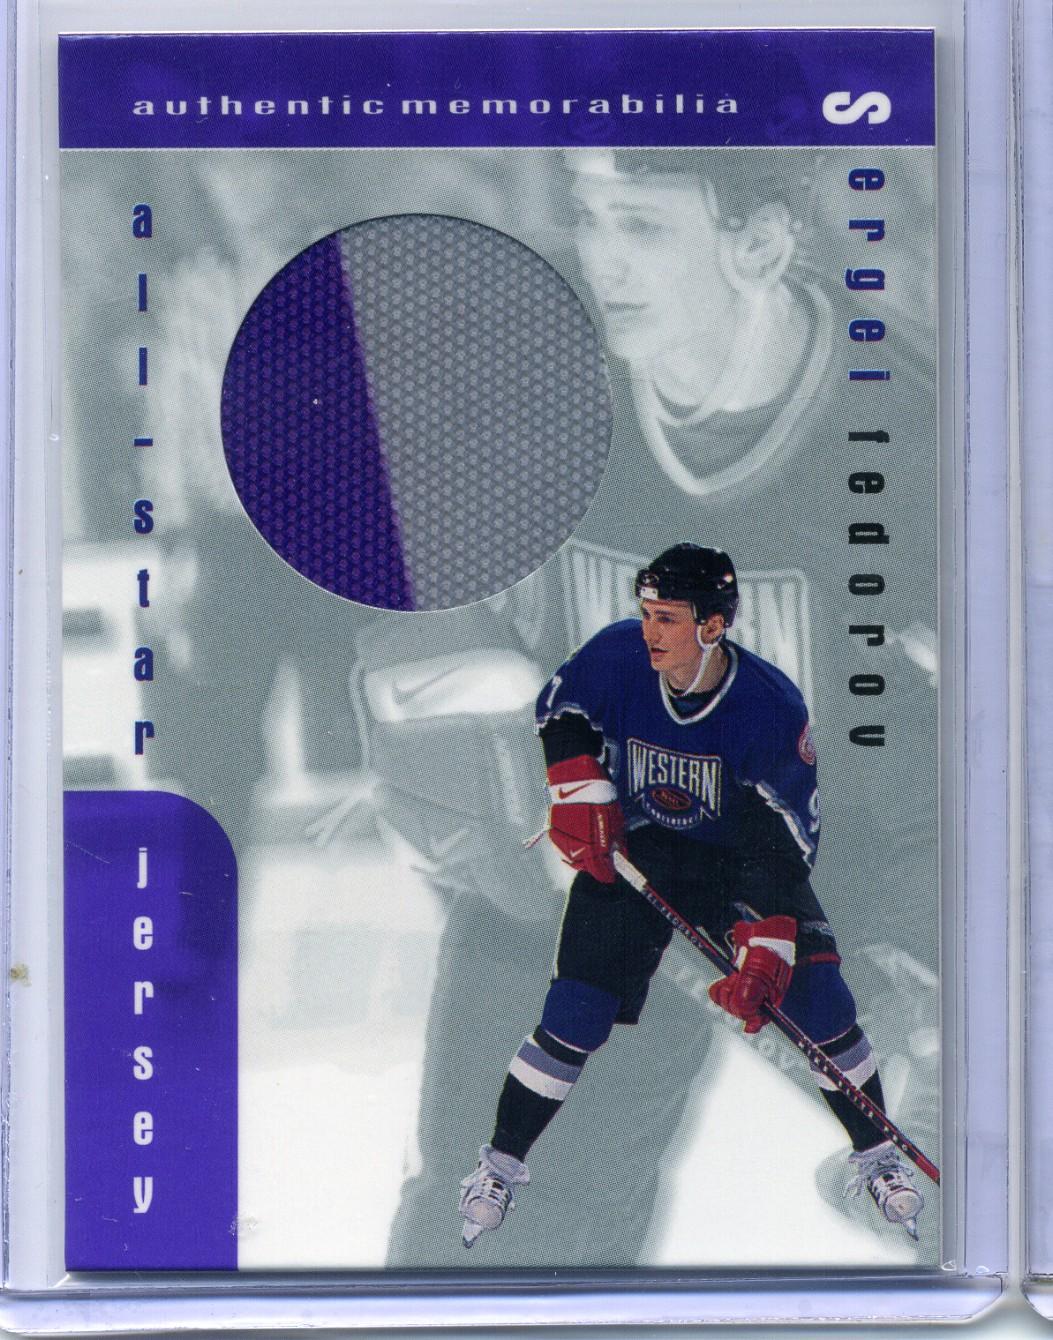 1999-00 BAP Memorabilia Jersey #J15 Sergei Fedorov